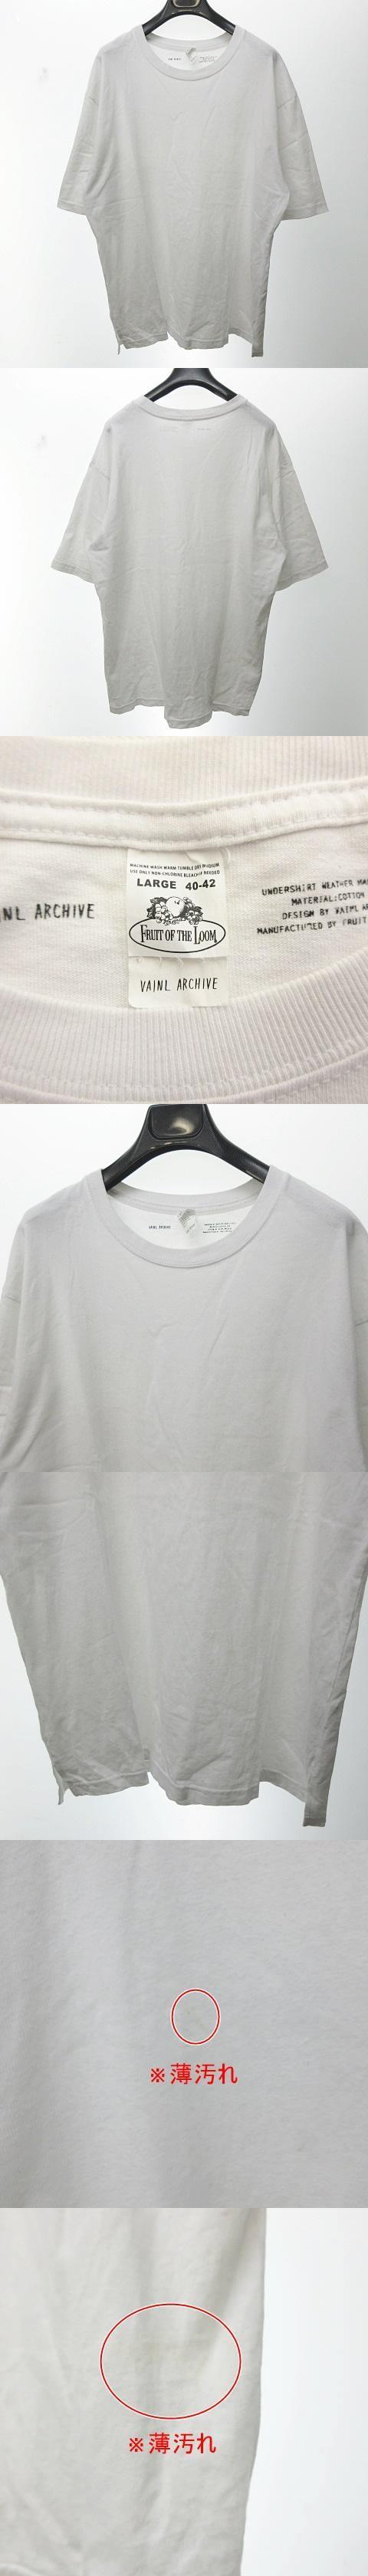 VAINL ARCHIVE × FRUIT OF THE LOOM ヴァイナルアーカイブ Tシャツ カットソー 半袖 白 ホワイト L 40-42 0803